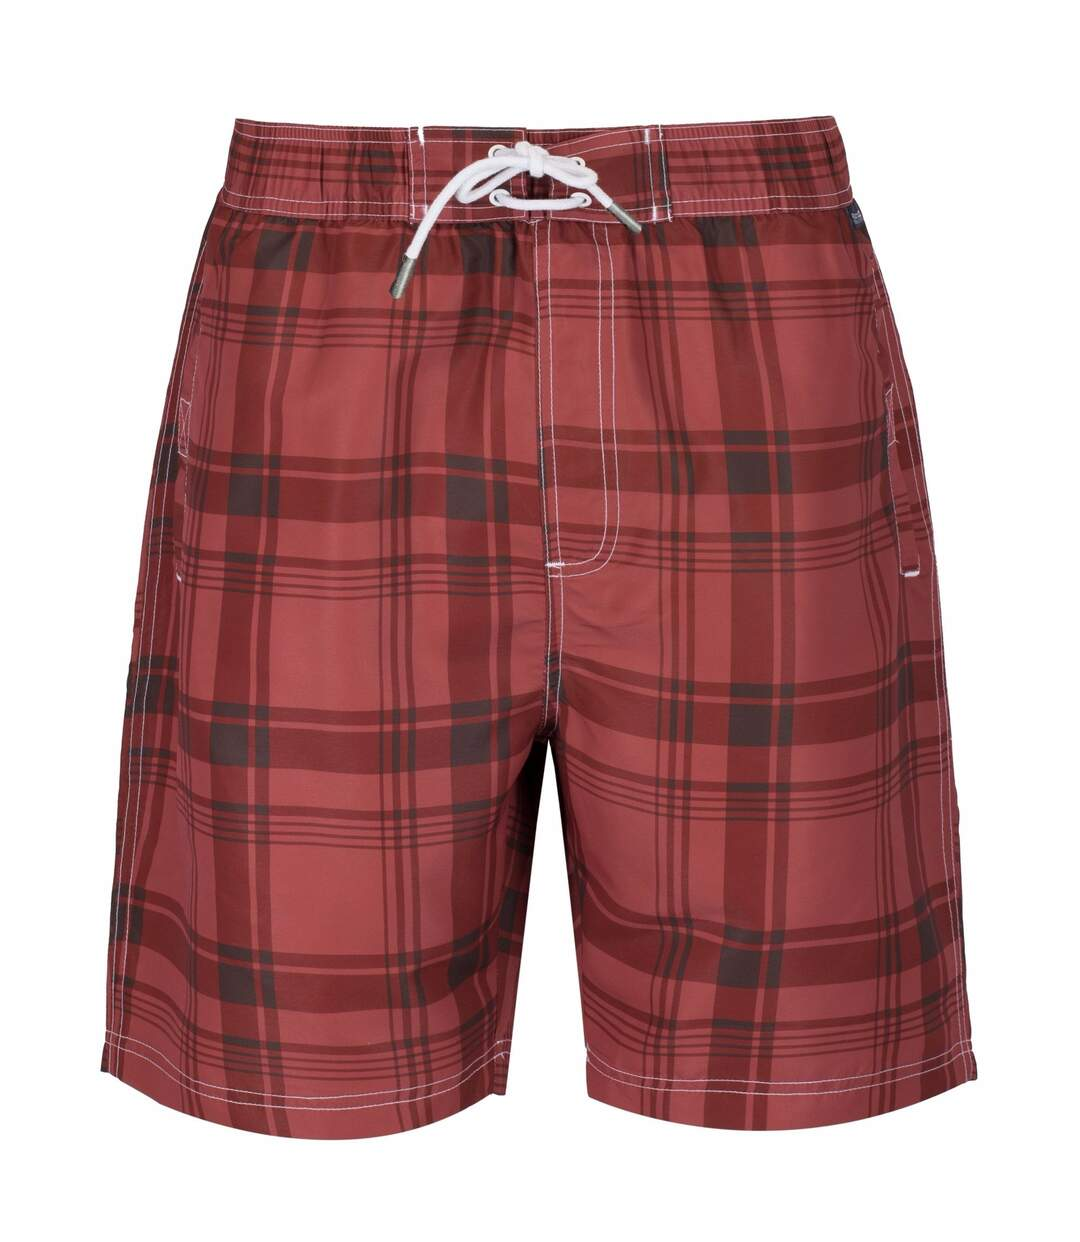 Regatta Great Outdoors Mens Hadden Board Shorts (Cowhide) - UTRG2734